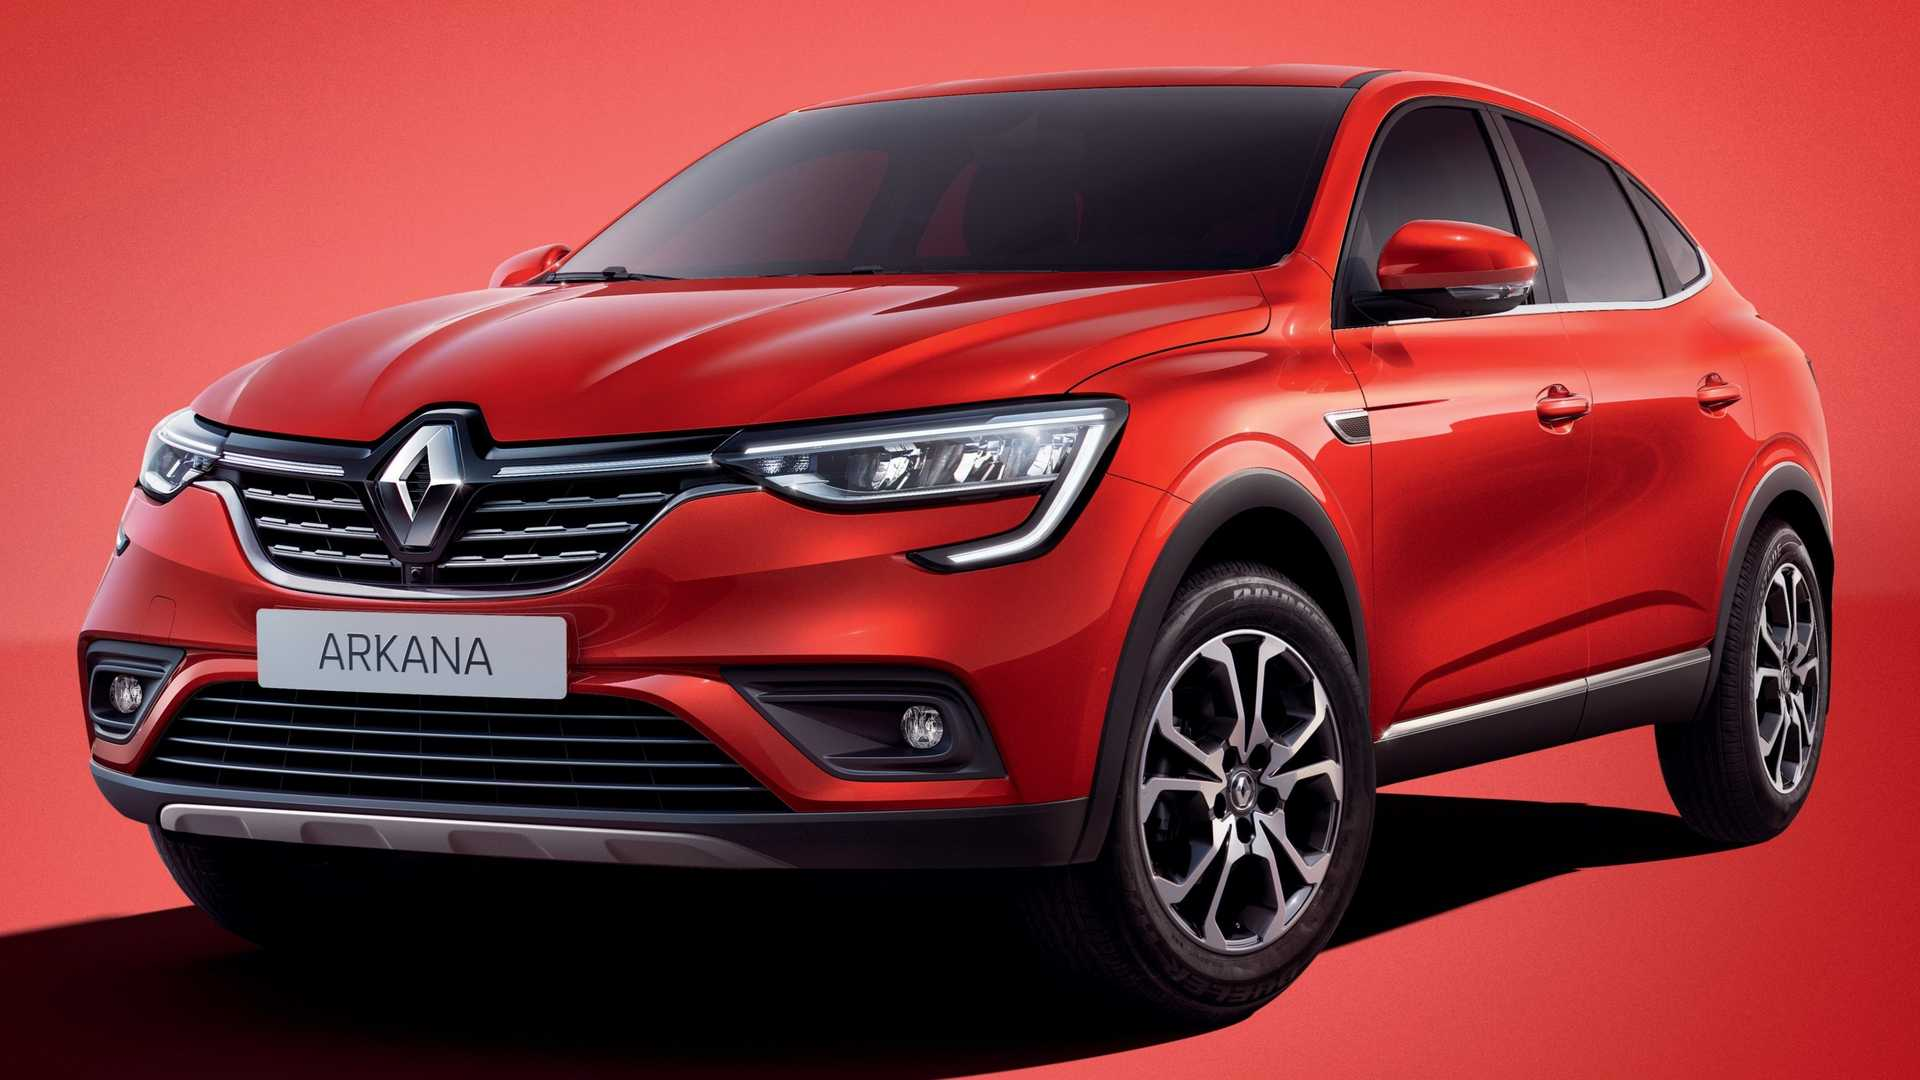 Renault Arkana Production Version Debuts in Russia 3